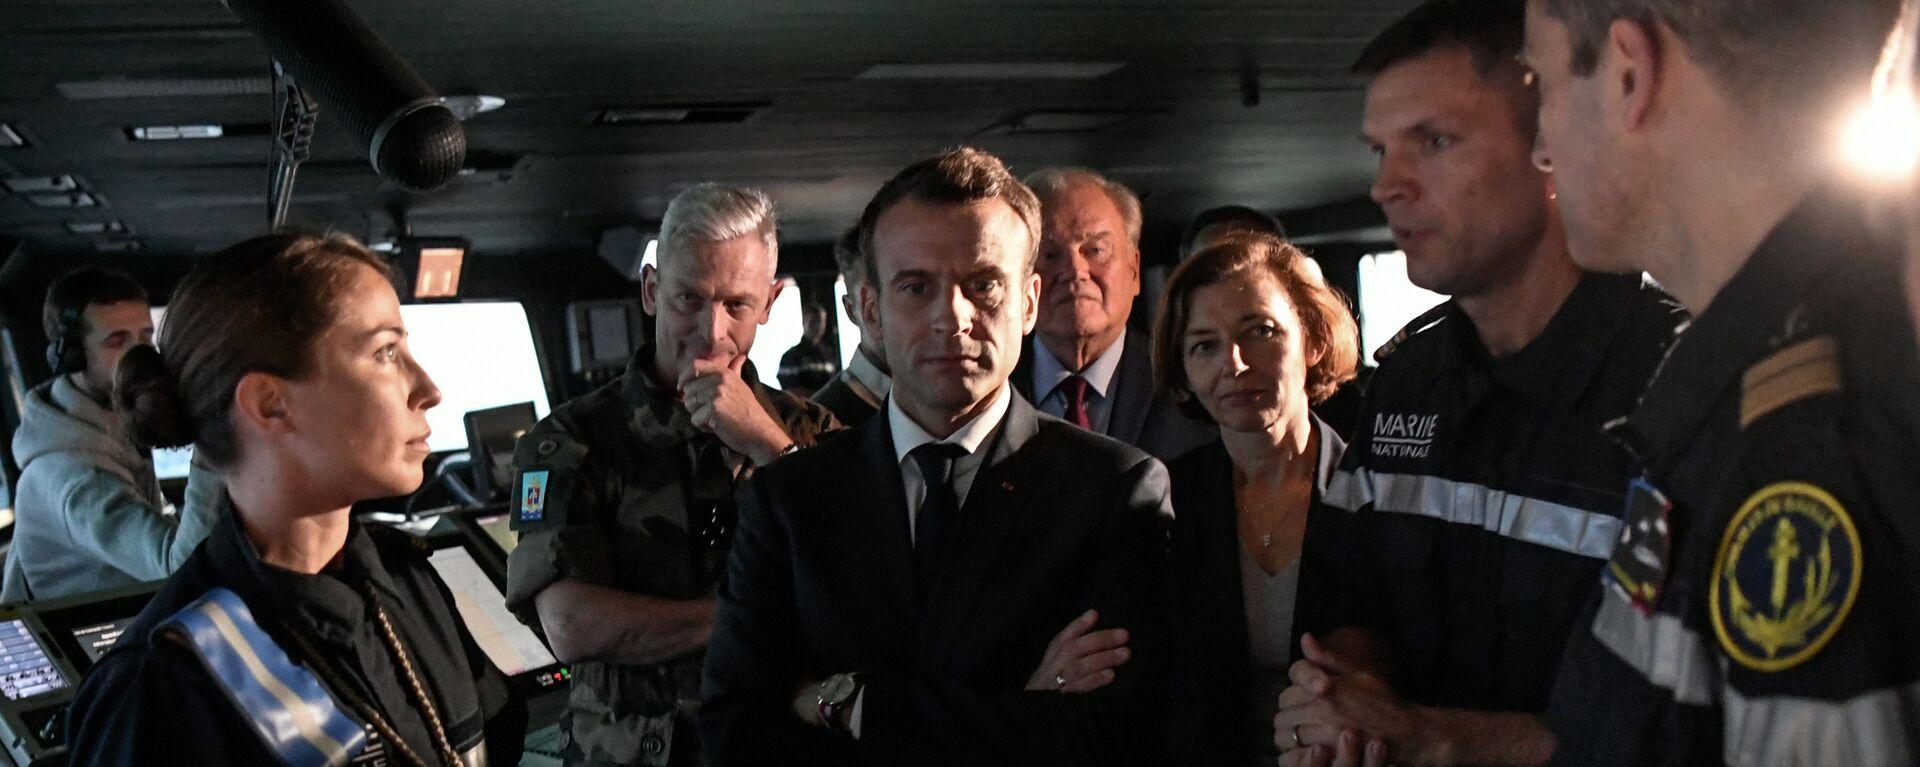 Emmanuel Macron (centro), presidente de Francia - Sputnik Mundo, 1920, 19.11.2018